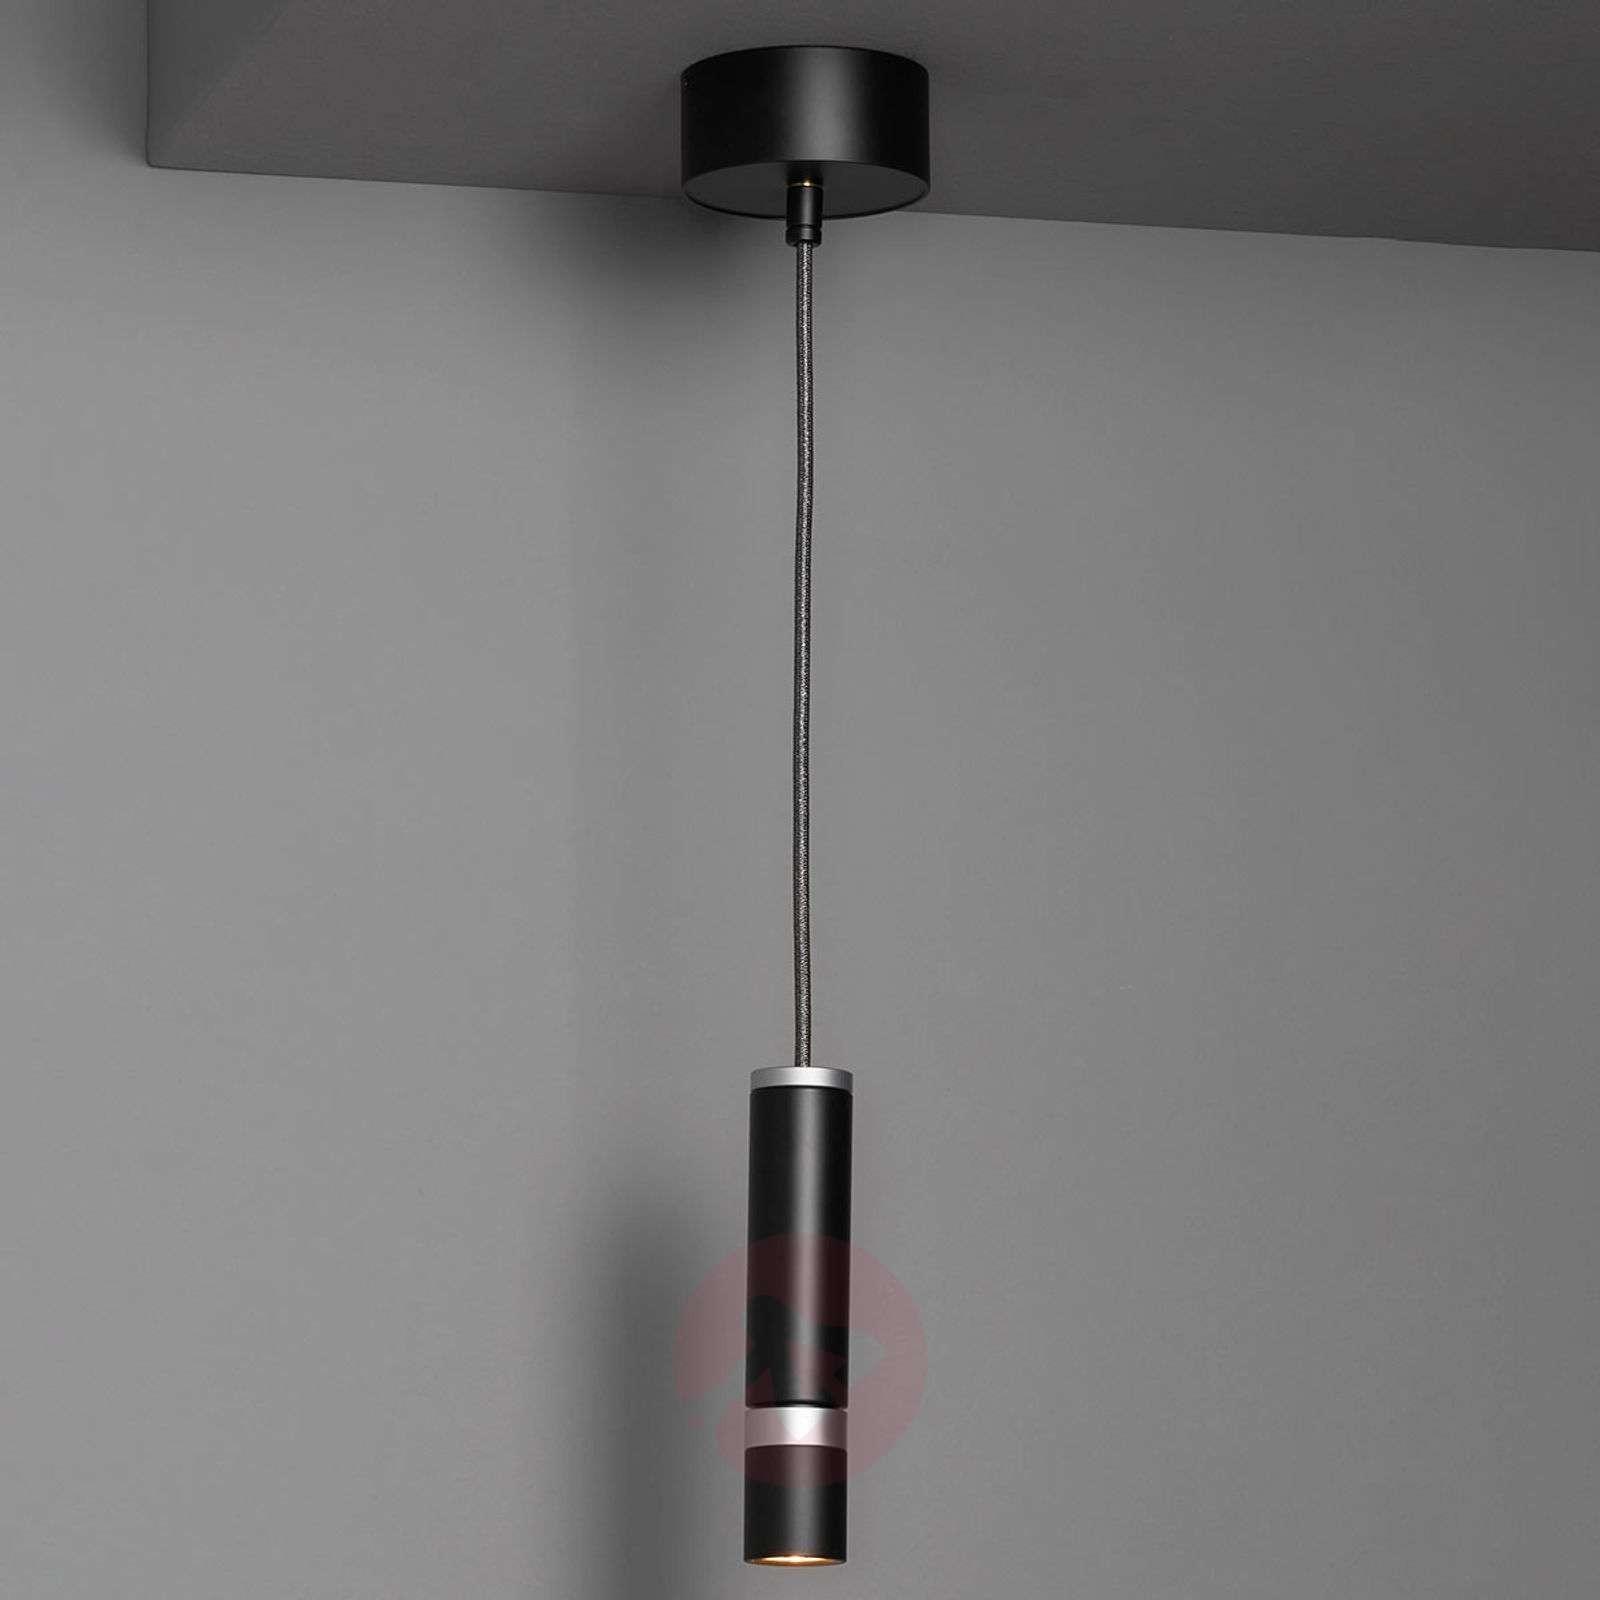 LDM Kyno Tavolo Uno LED hanging light, matt black-6101037-01